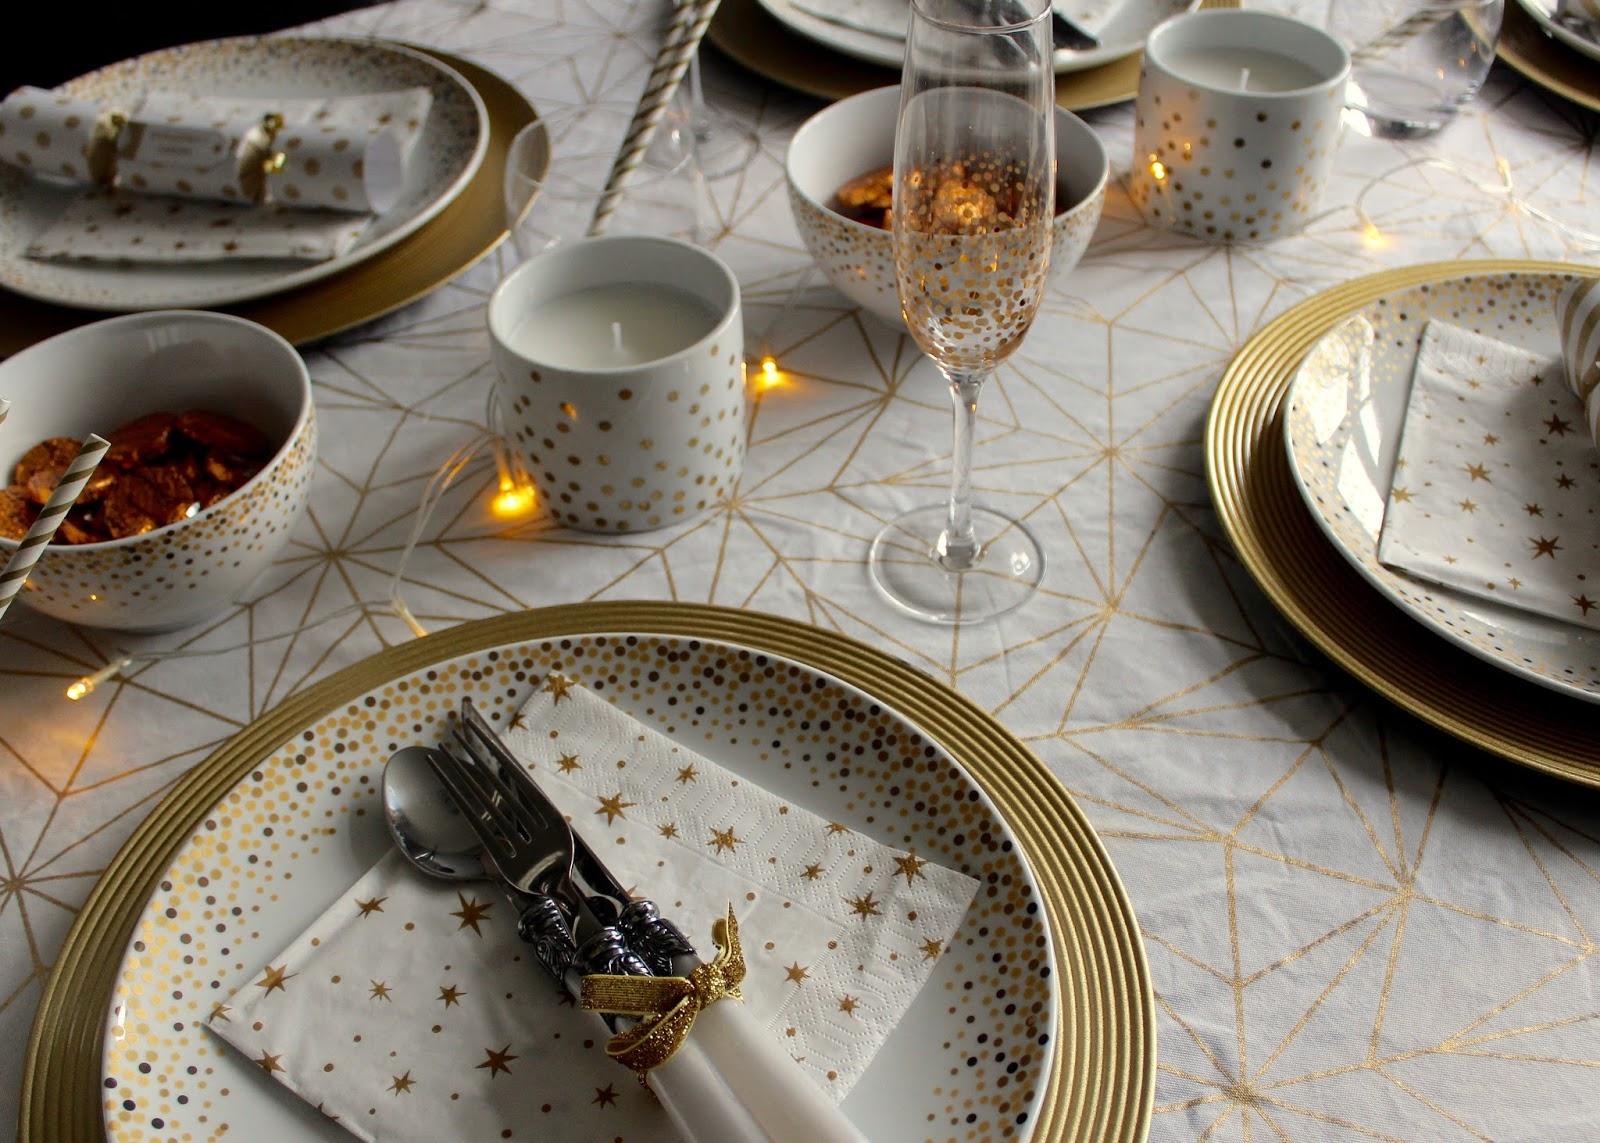 Home For Christmas Decorations Tableware And Comforts & Christmas Tableware Uk - Home Decorating Ideas \u0026 Interior Design